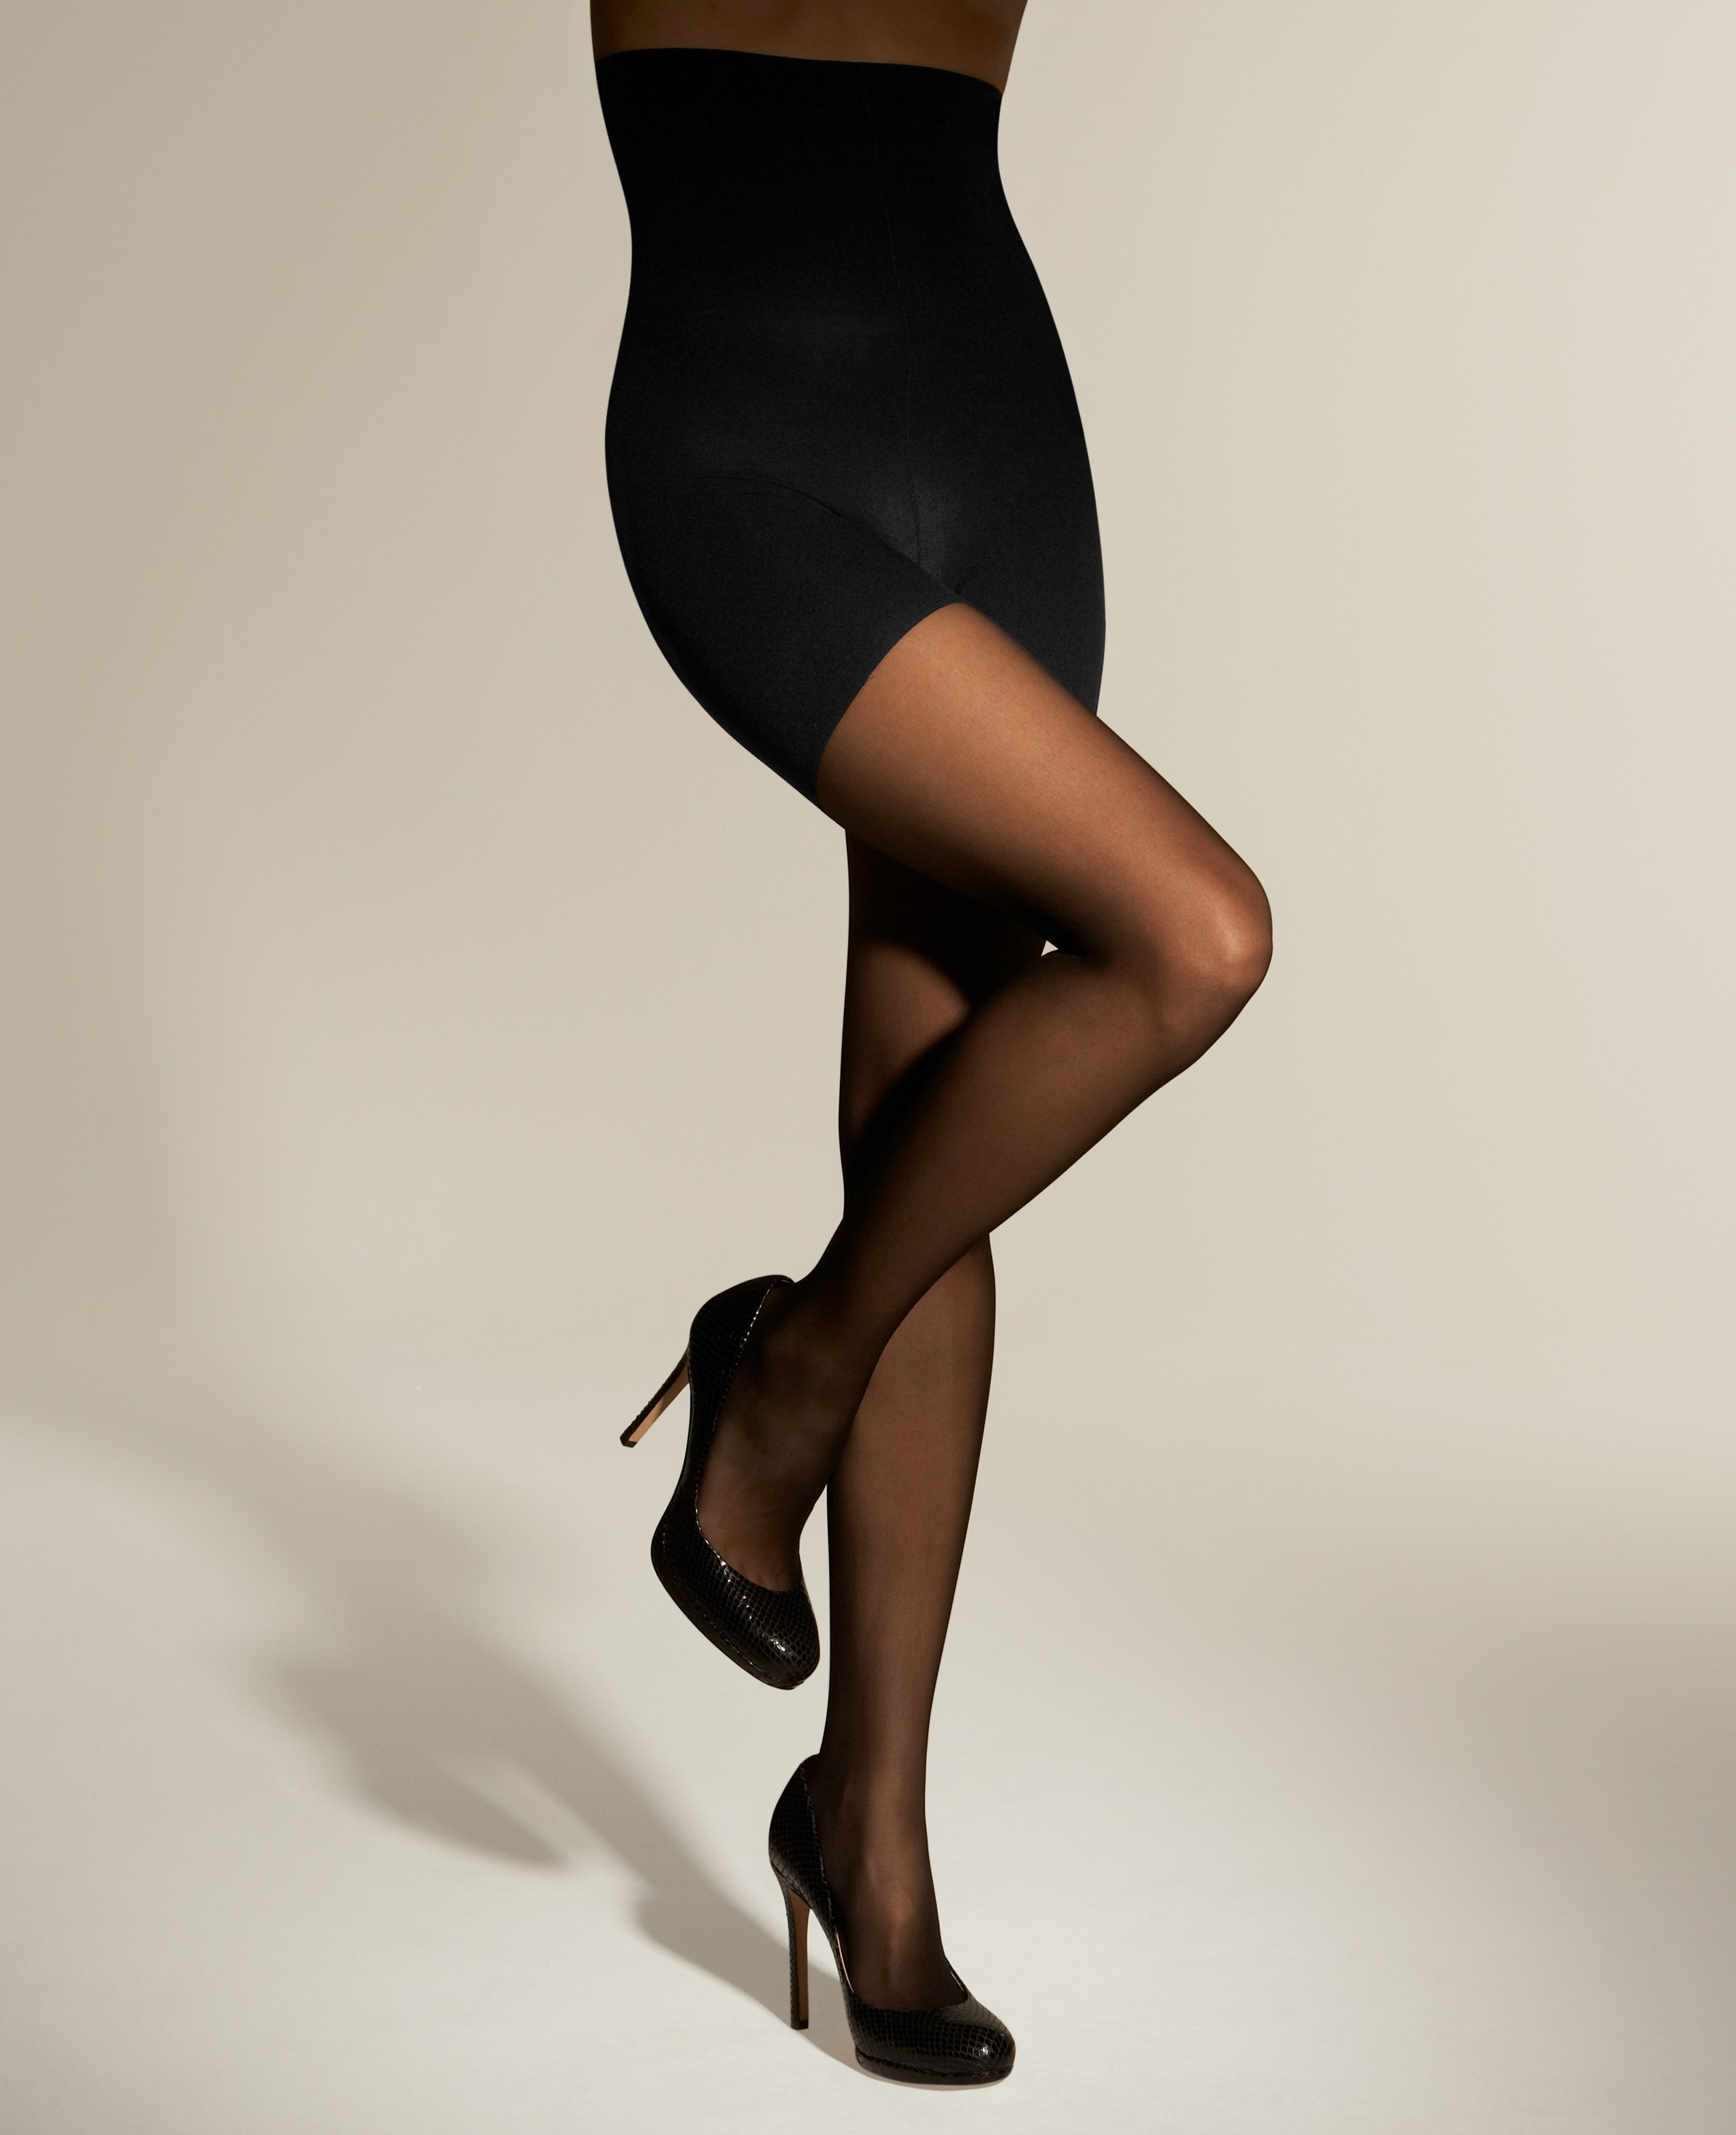 Lyst - Ann Taylor High Waist Control Top Sheer Tights In Black-2644